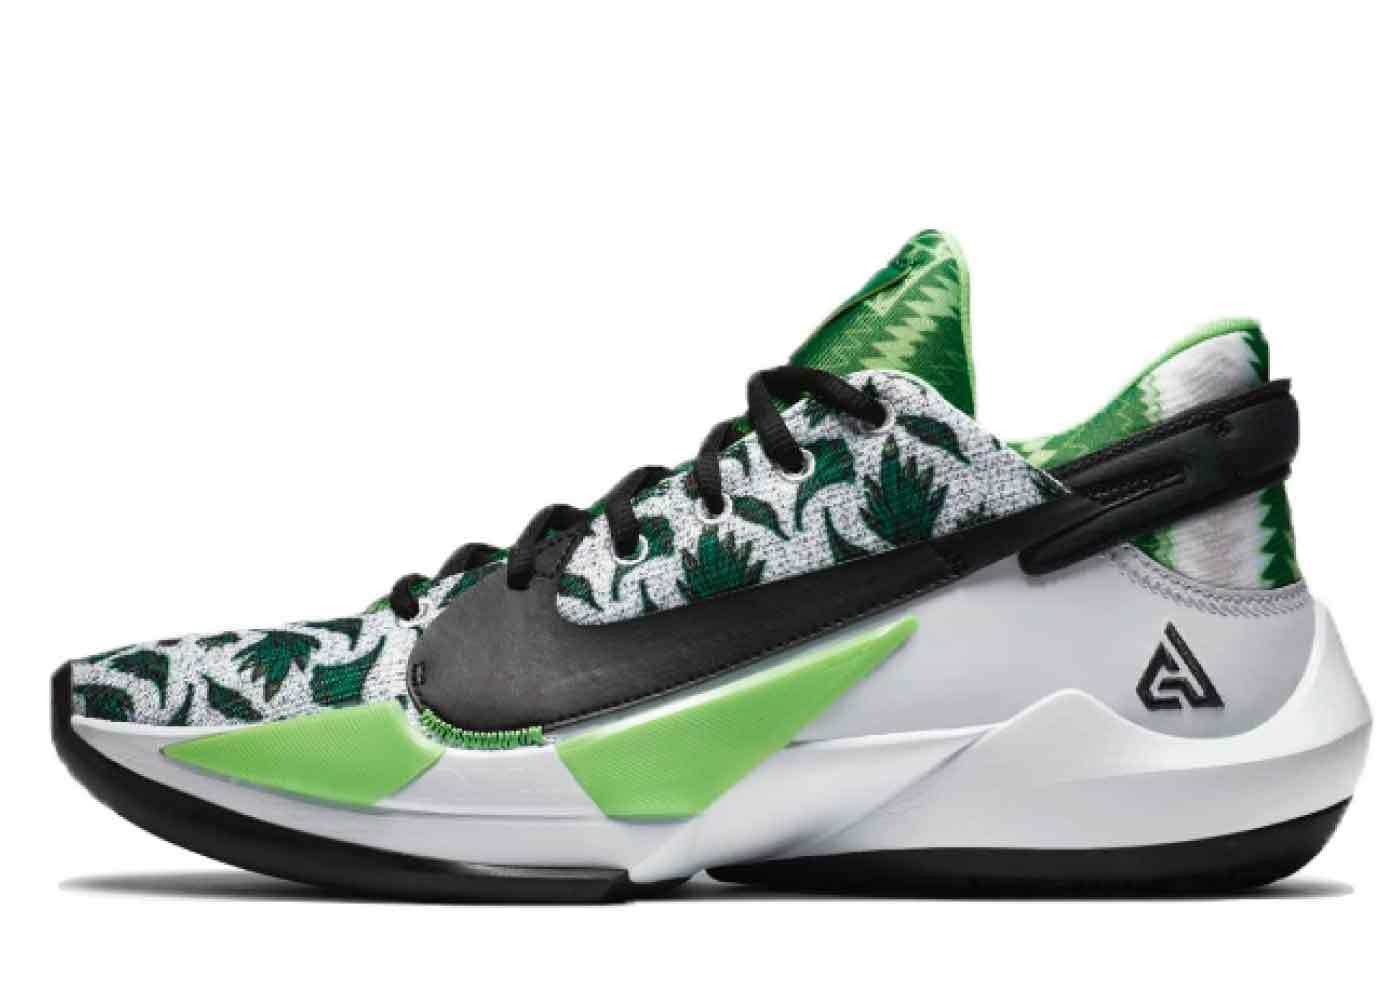 Nike Zoom Freak 2 Naijaの写真